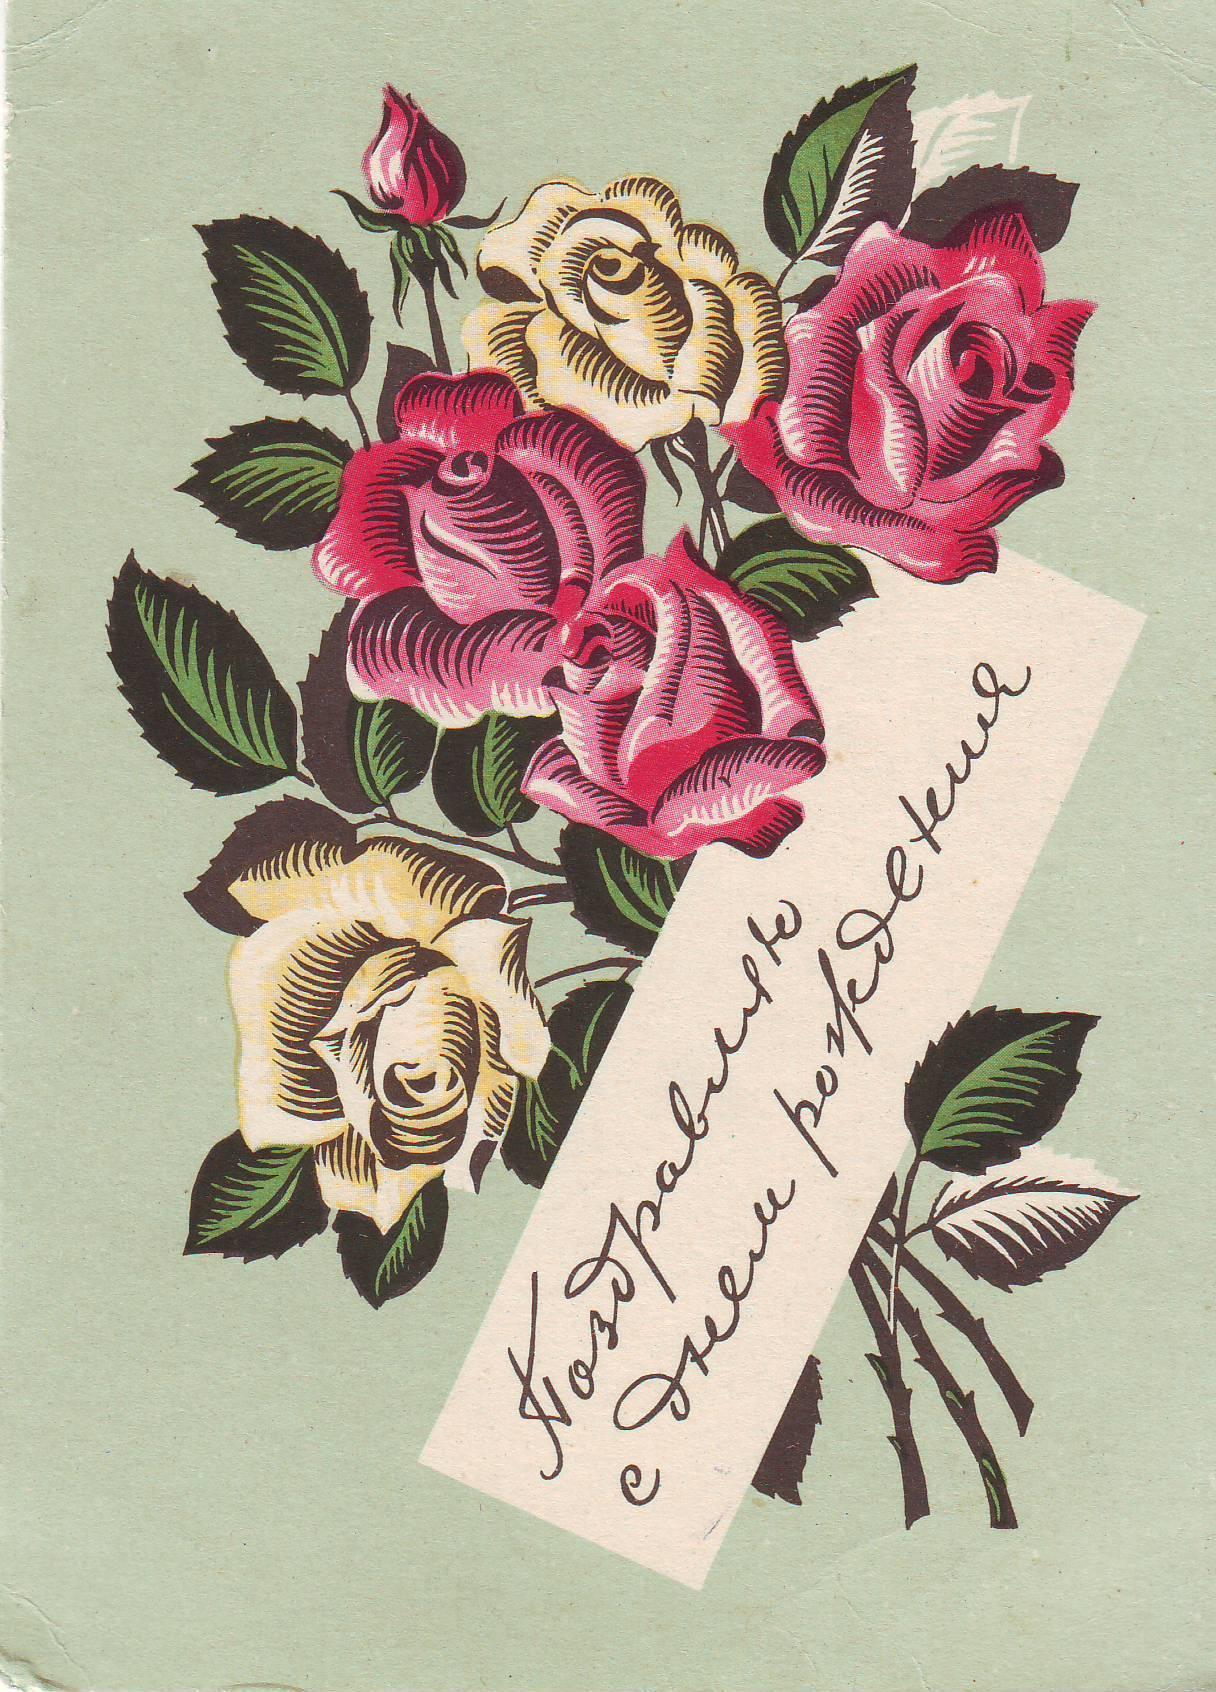 Финскими бабками, открытки цветок юности